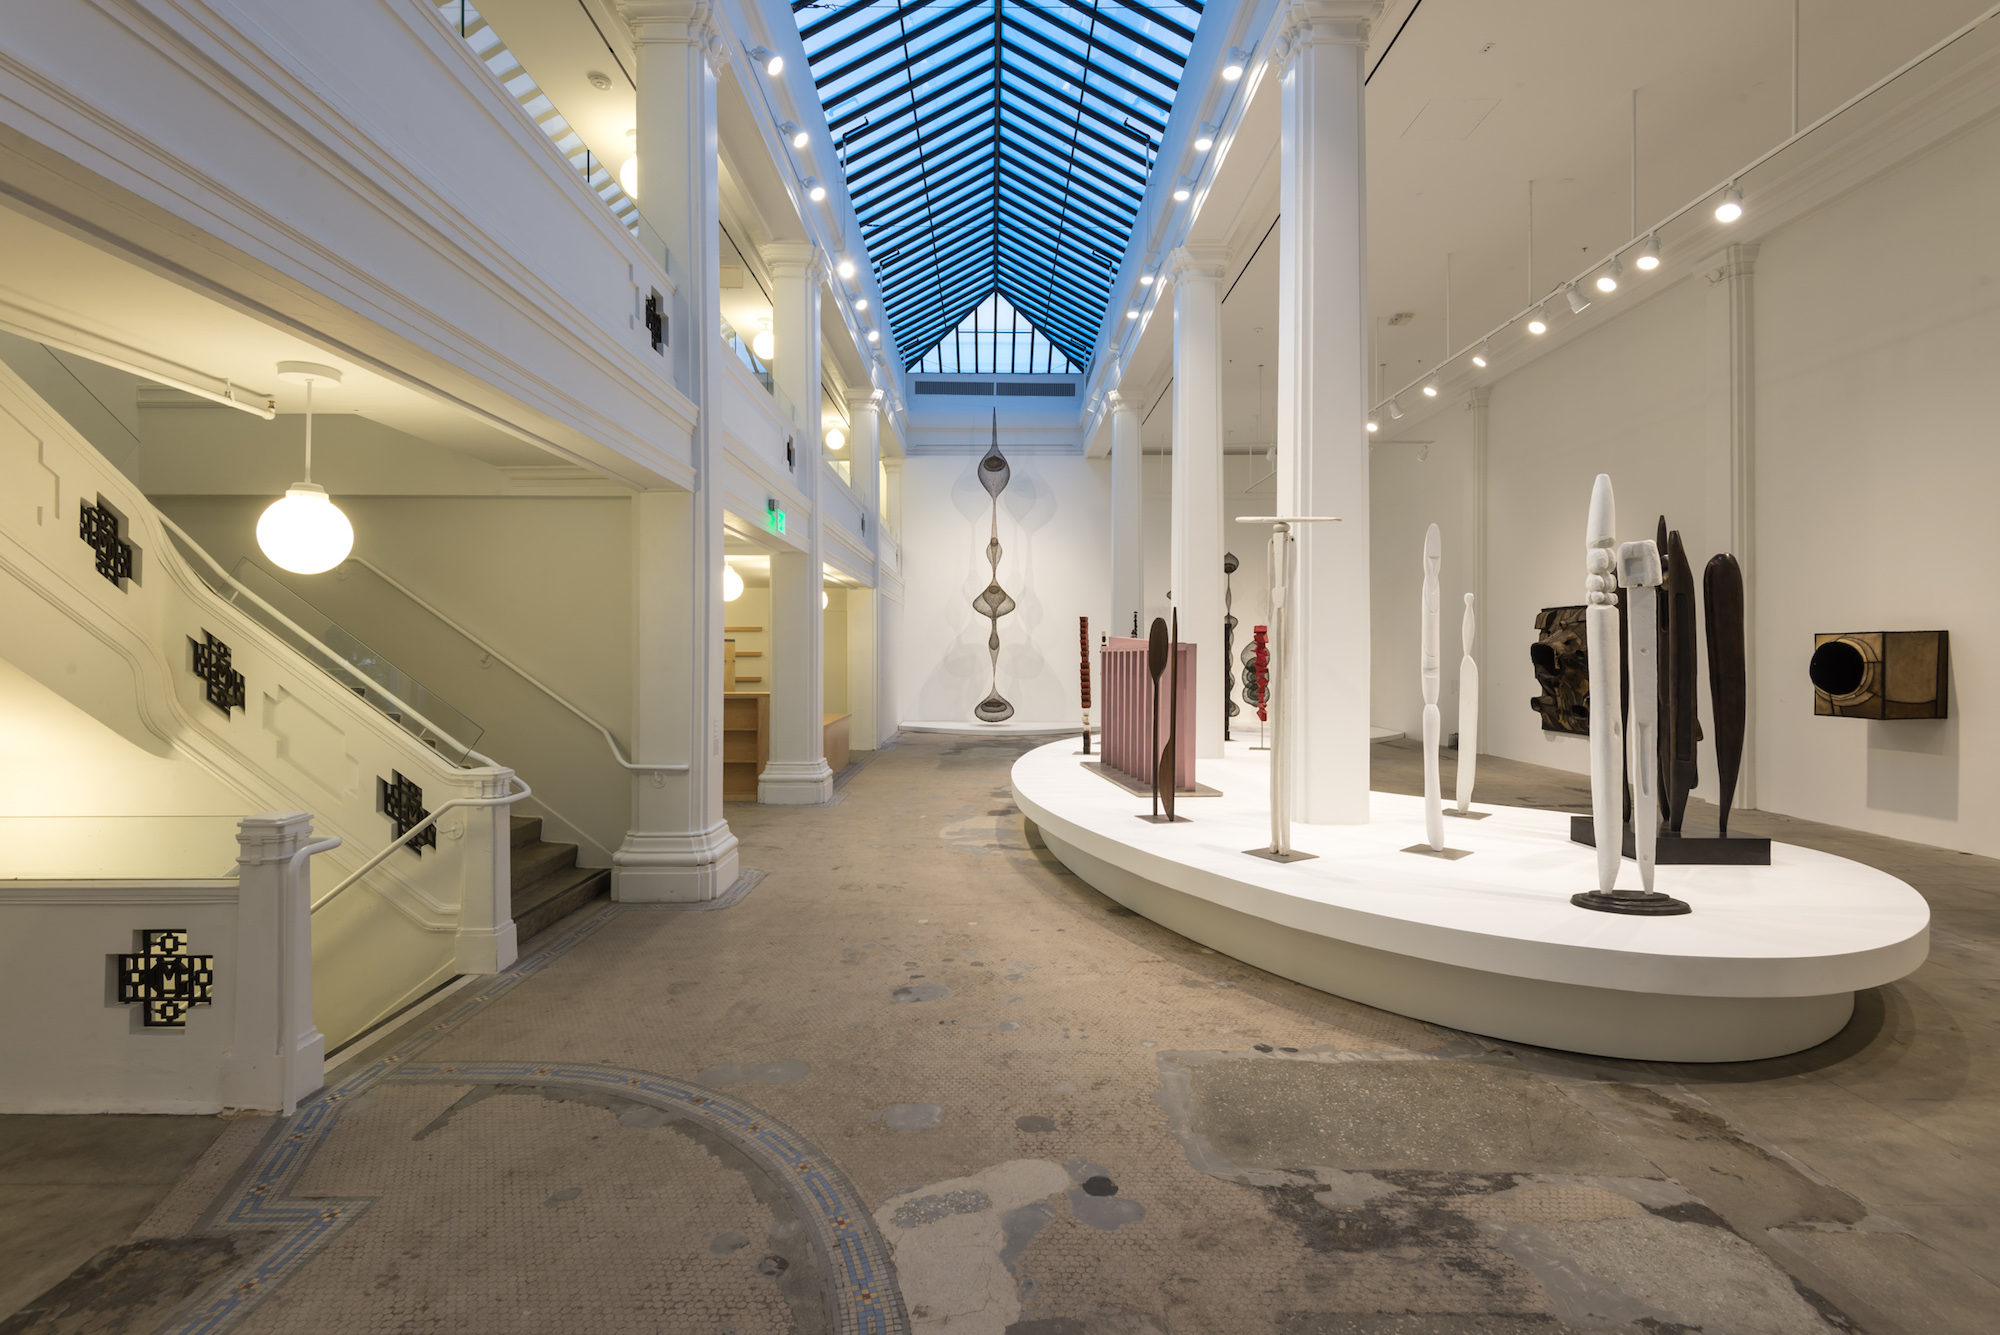 luxus hotel interieur paris angelo cappelini, power 100 - surface, Design ideen